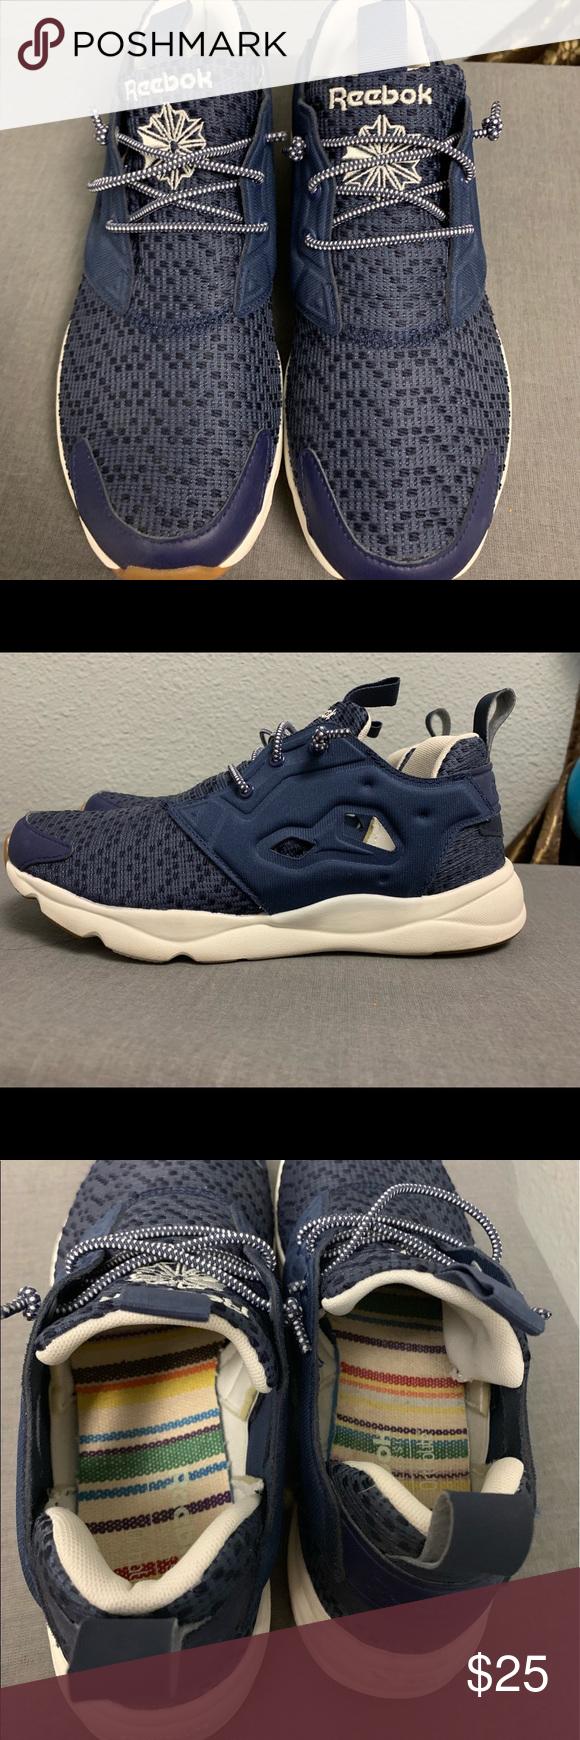 Reebok ortholite Shoes Navy blue Reebok